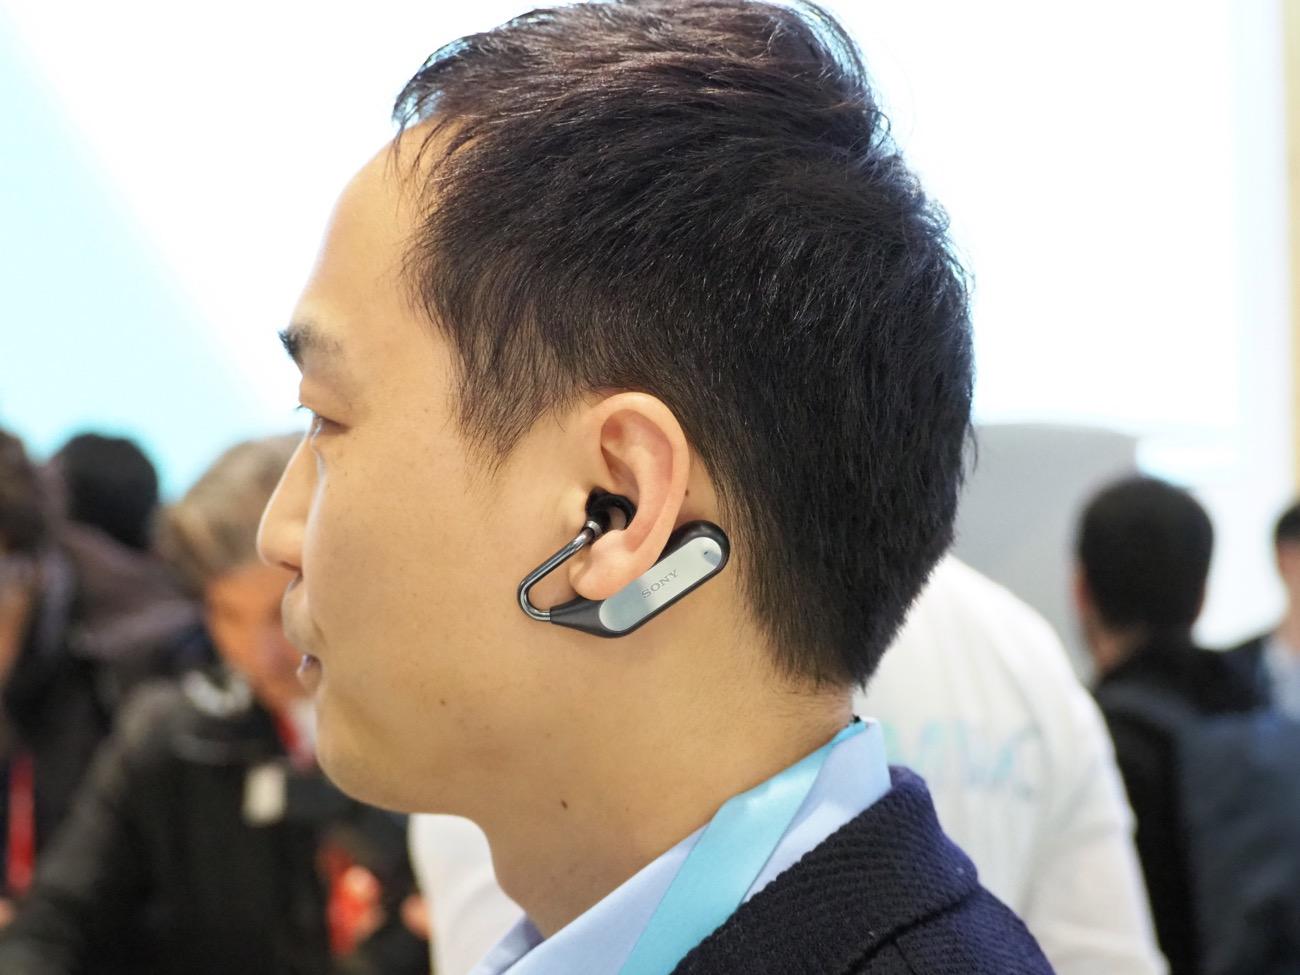 P2260317 - ソニーから遮音しない左右独立スマートイアホン「Xperia Ear Duo」4/21発売